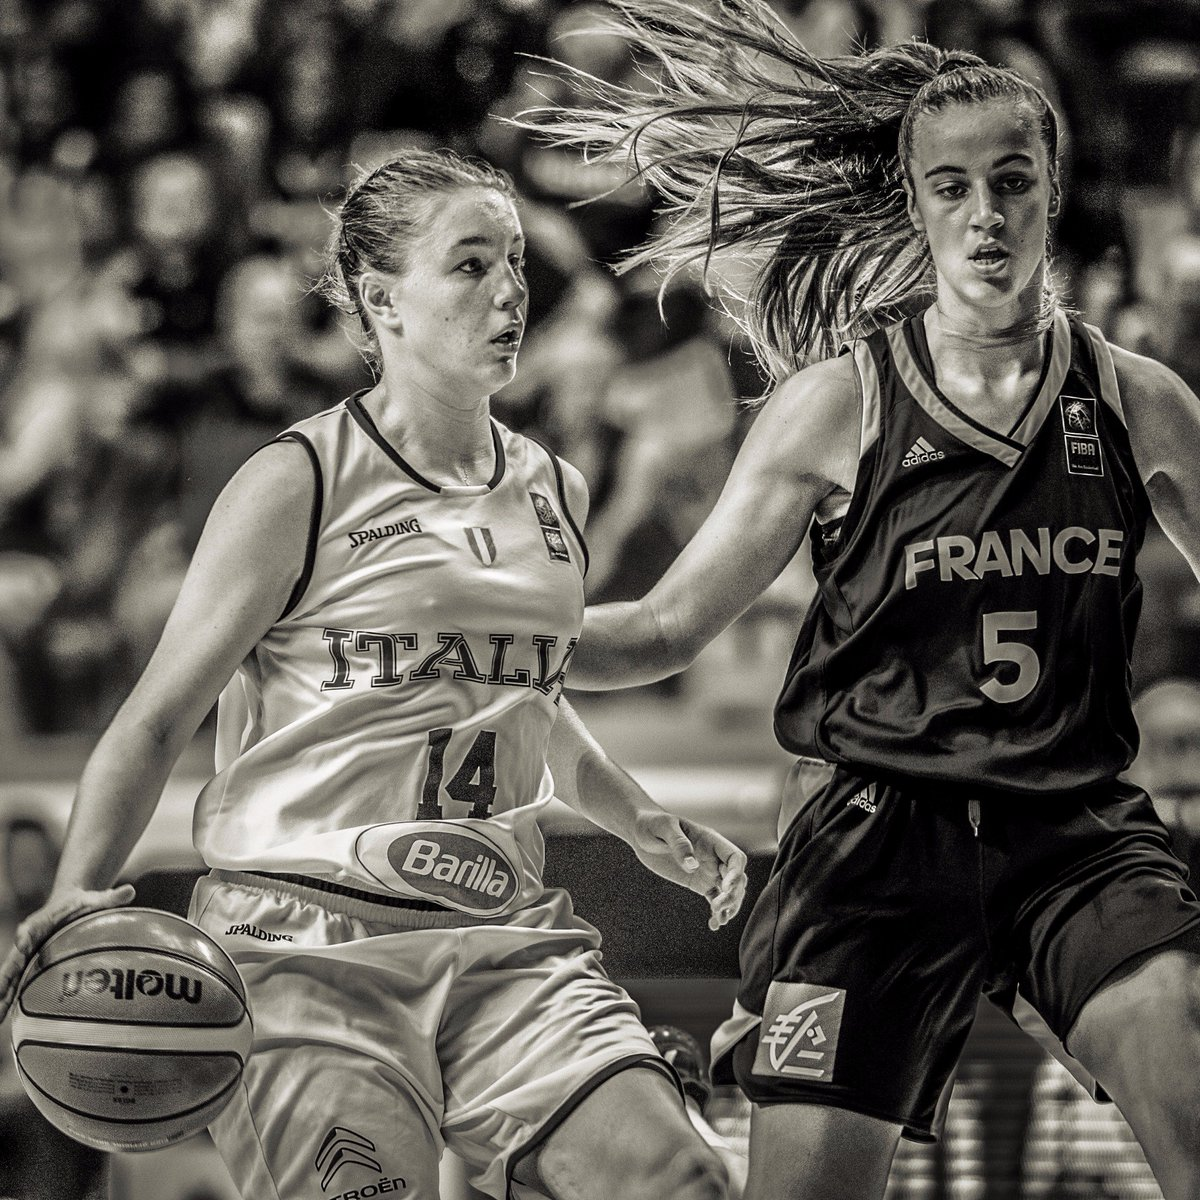 Stellar work from our expert @pierrepiotr_ He picks his 1st & 2nd All-Tournament Team from #FIBAU16Europe last month  http://www. bluestarmedia.org/fiba-europe-u1 6-players-review-part-1/  … pic.twitter.com/2NcOm3o0vi